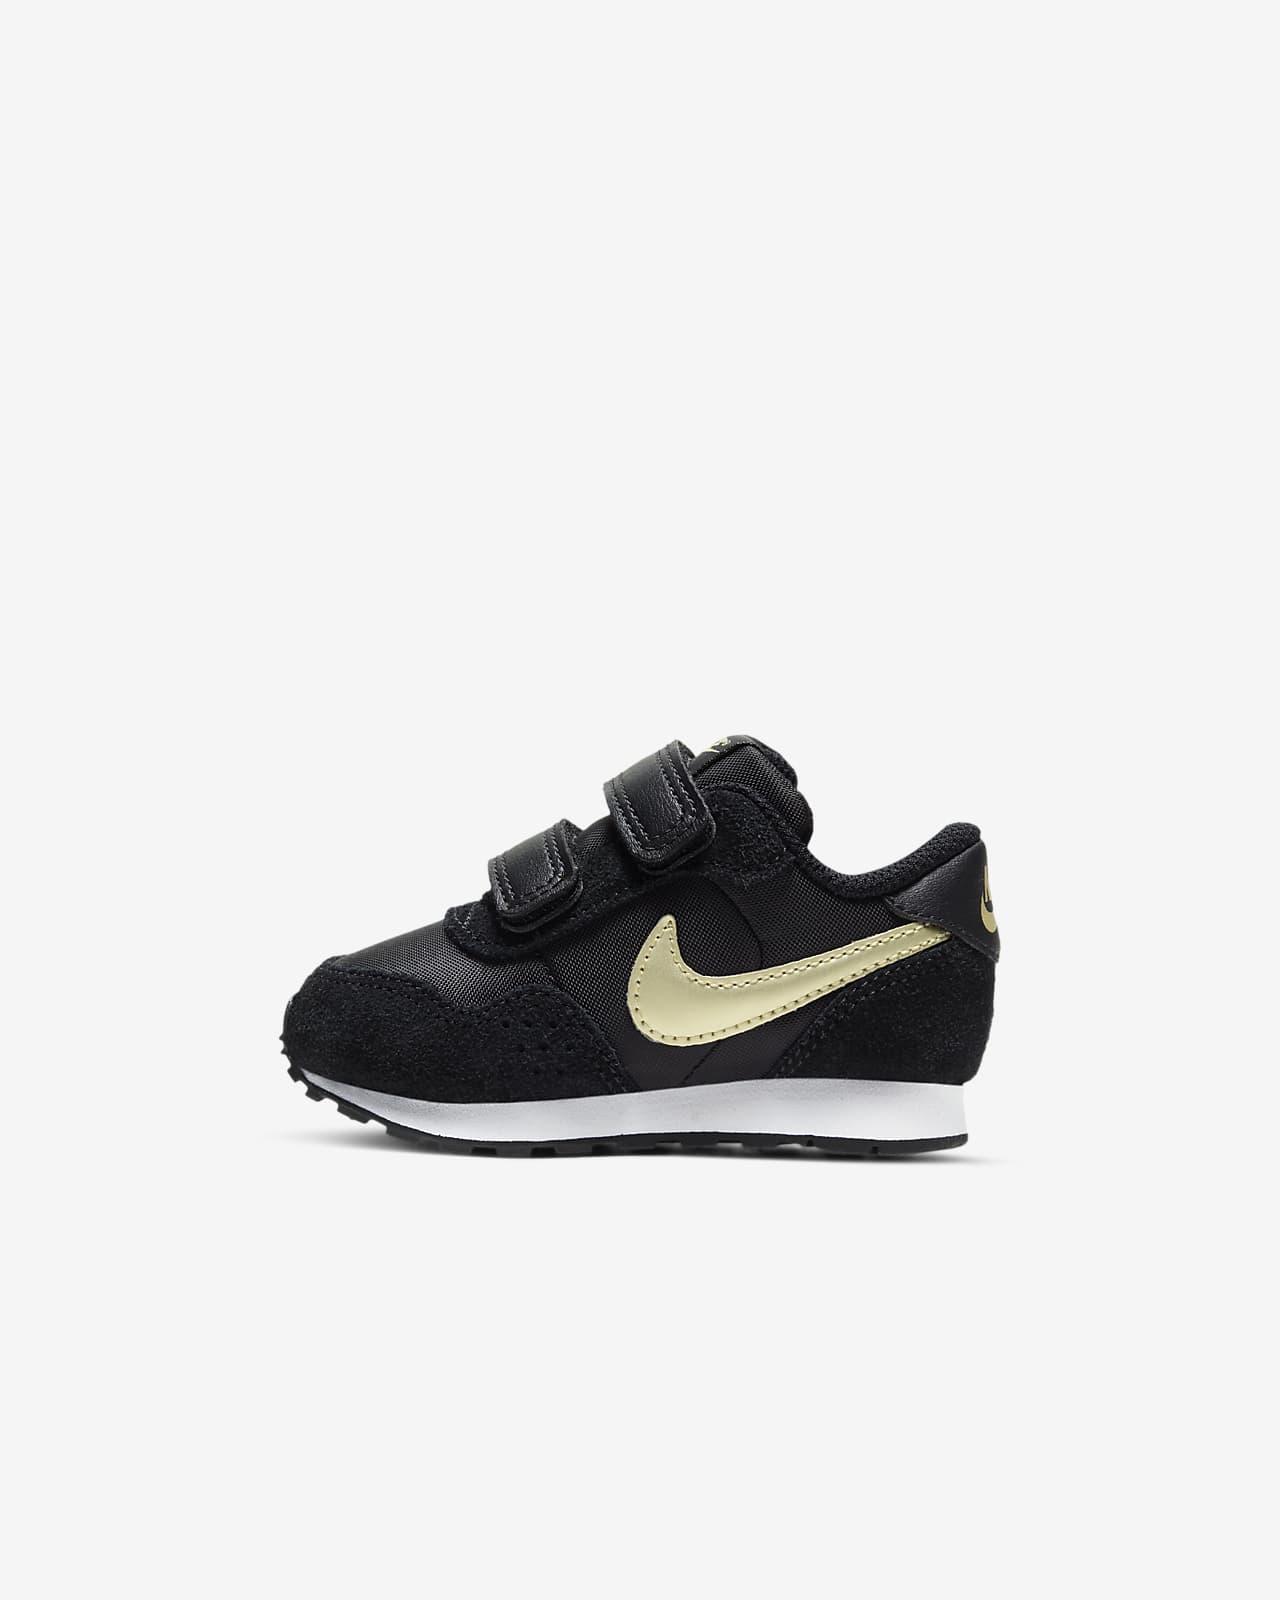 Nike MD Valiant sko til sped-/småbarn